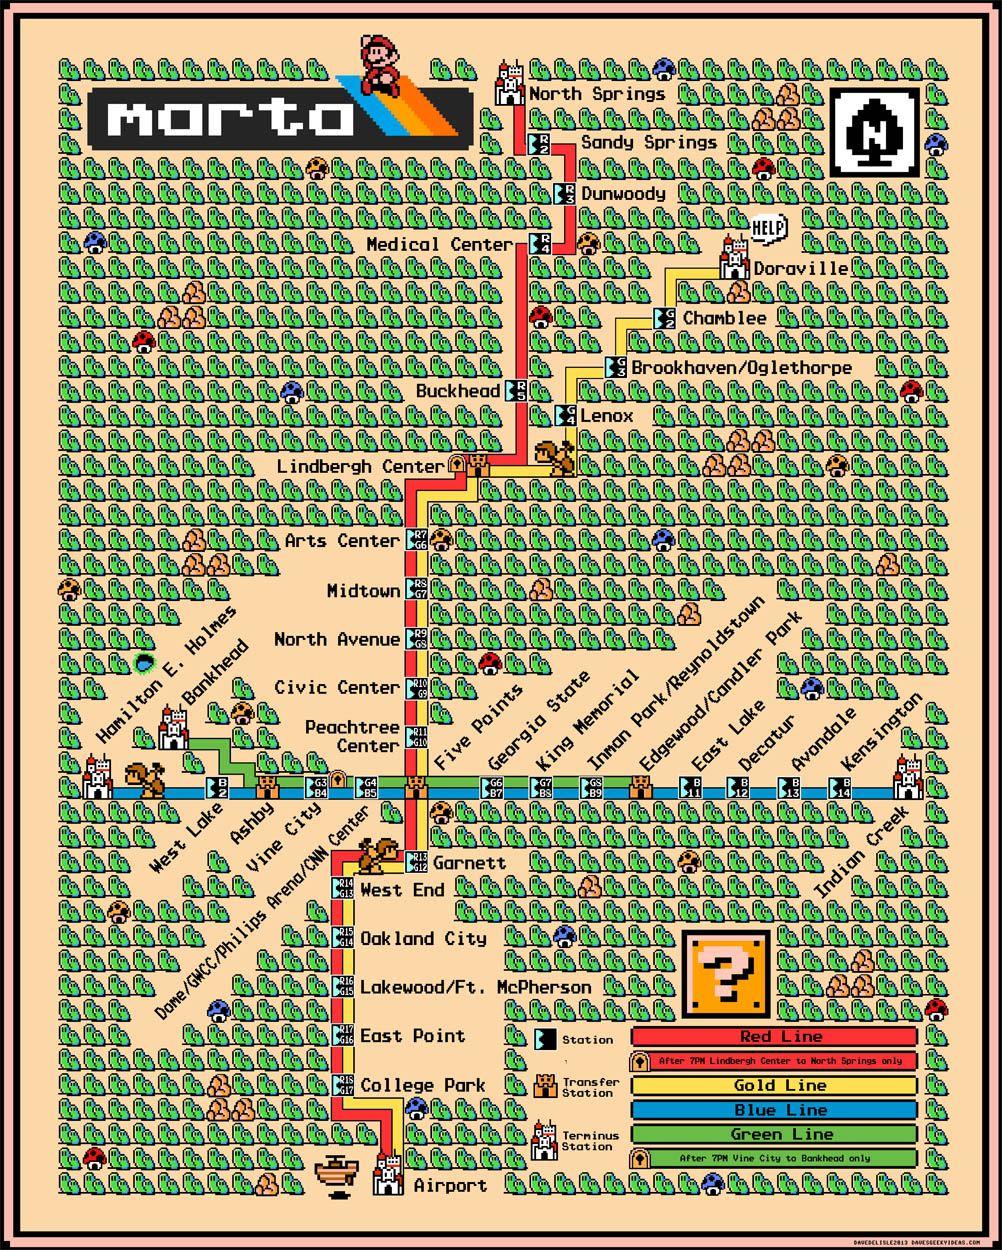 The Atlanta Subway System Marta By Dave Delisle Subway Going